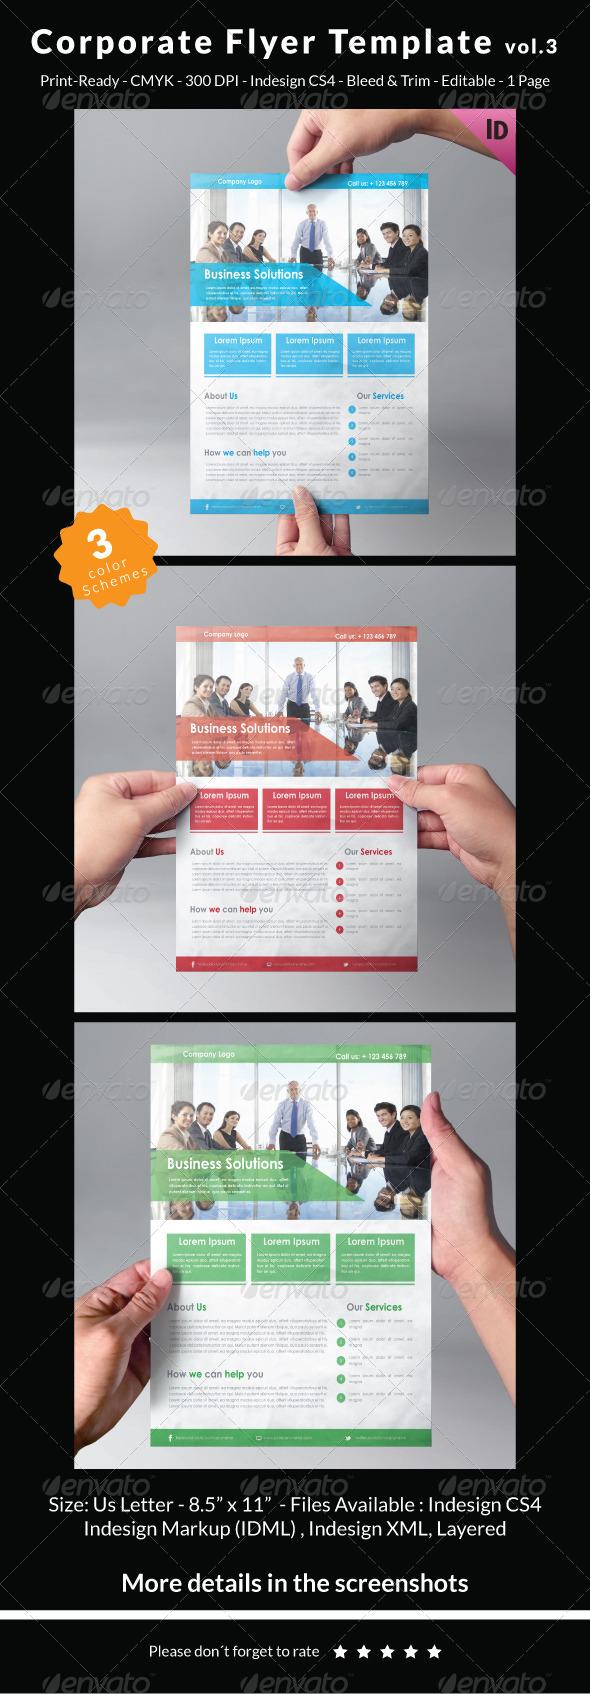 Corporate Flyer Template Vol.3 - Corporate Flyers